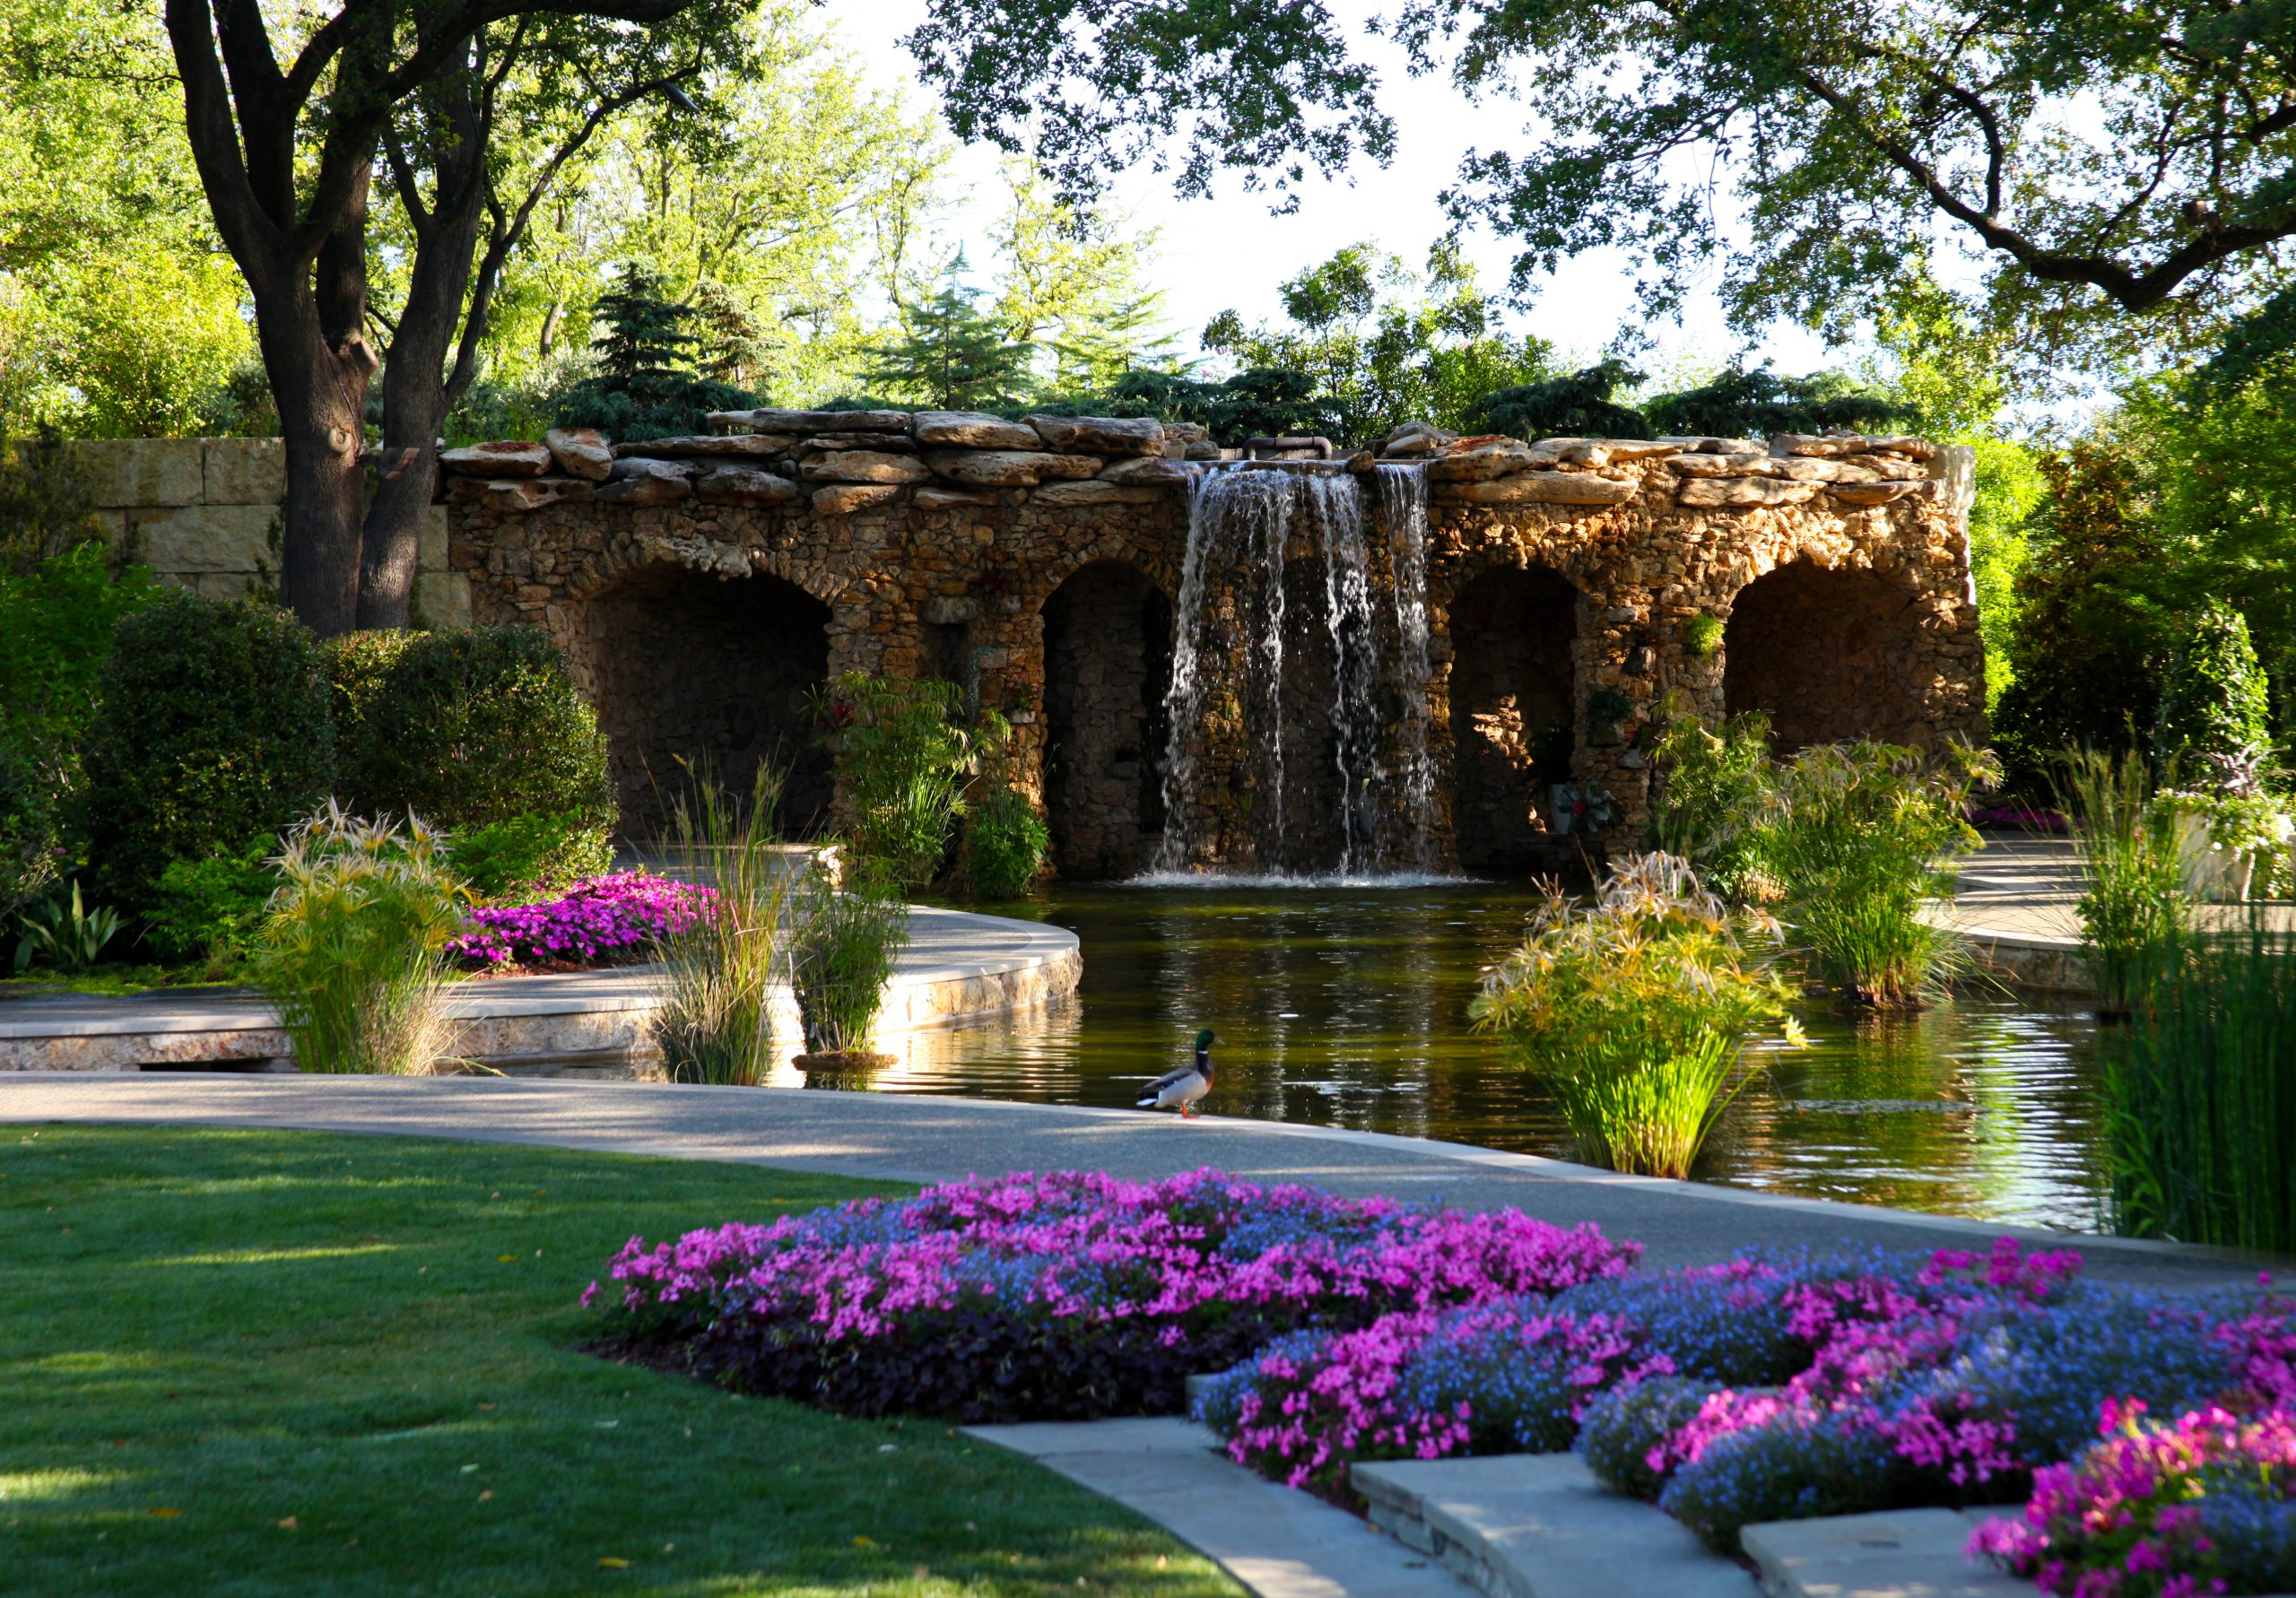 Lay Family Grotto at Dallas Arboretum